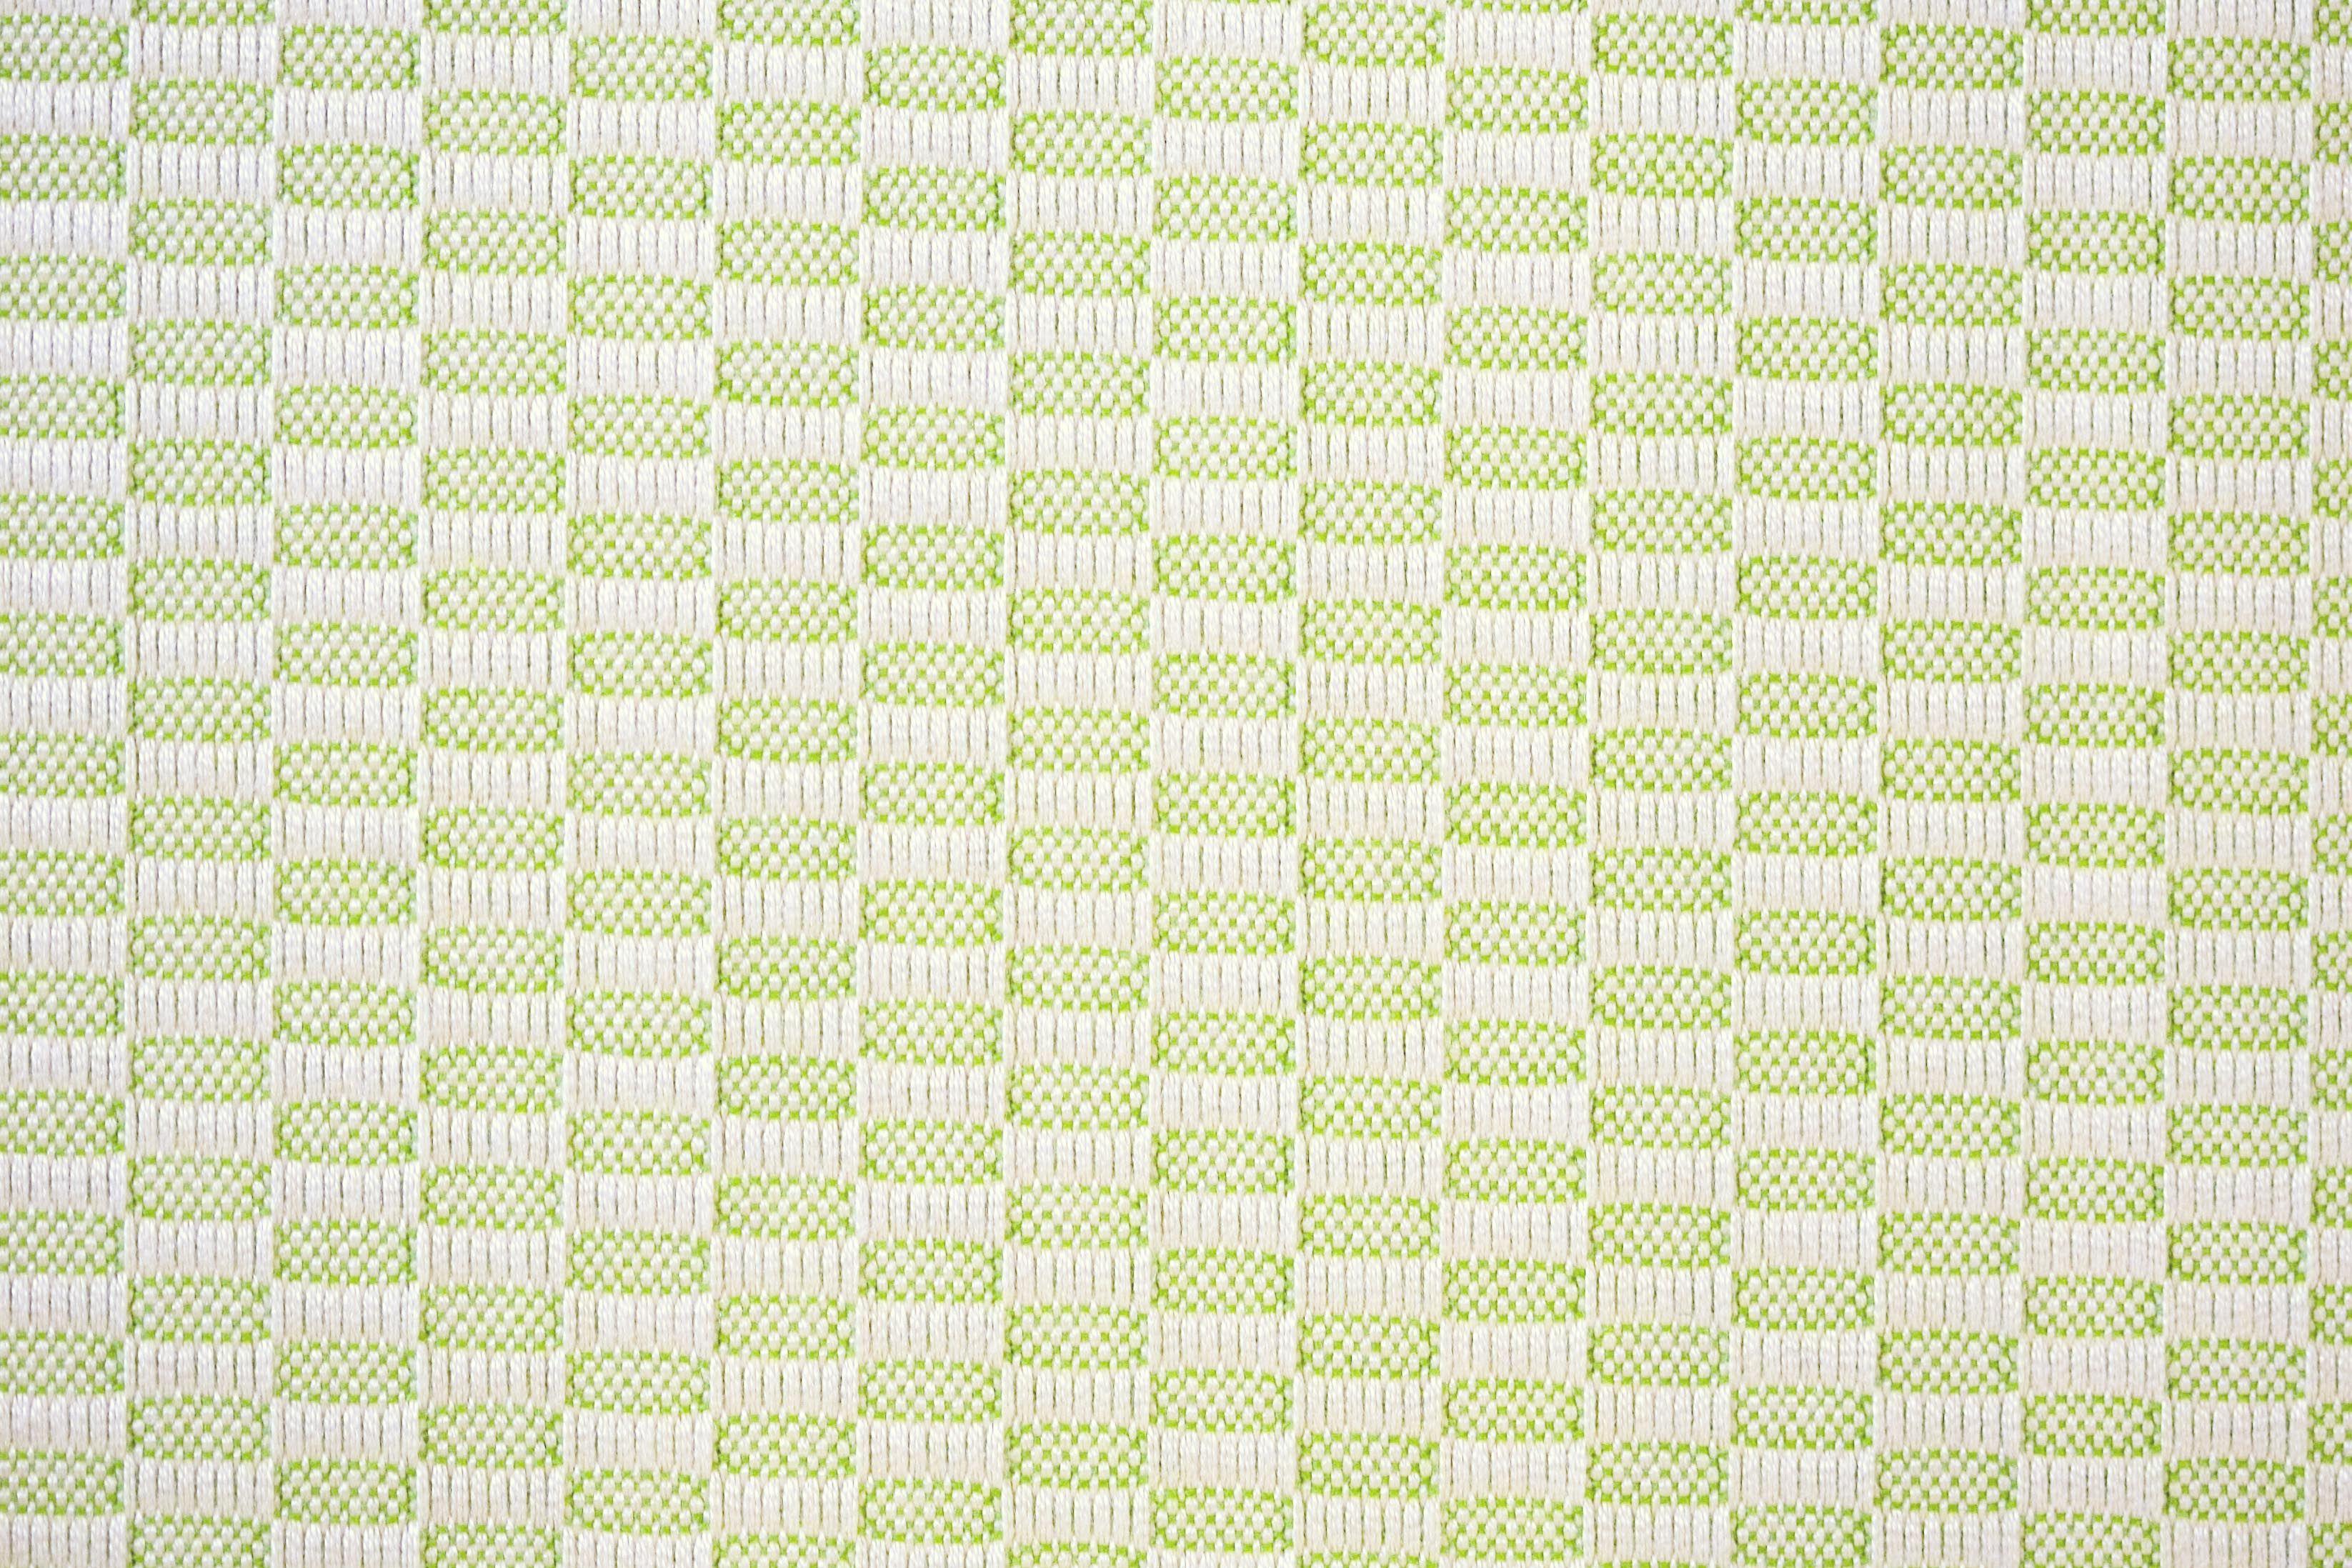 Chella Textiles Fretwork In Kiwi With Images Chella